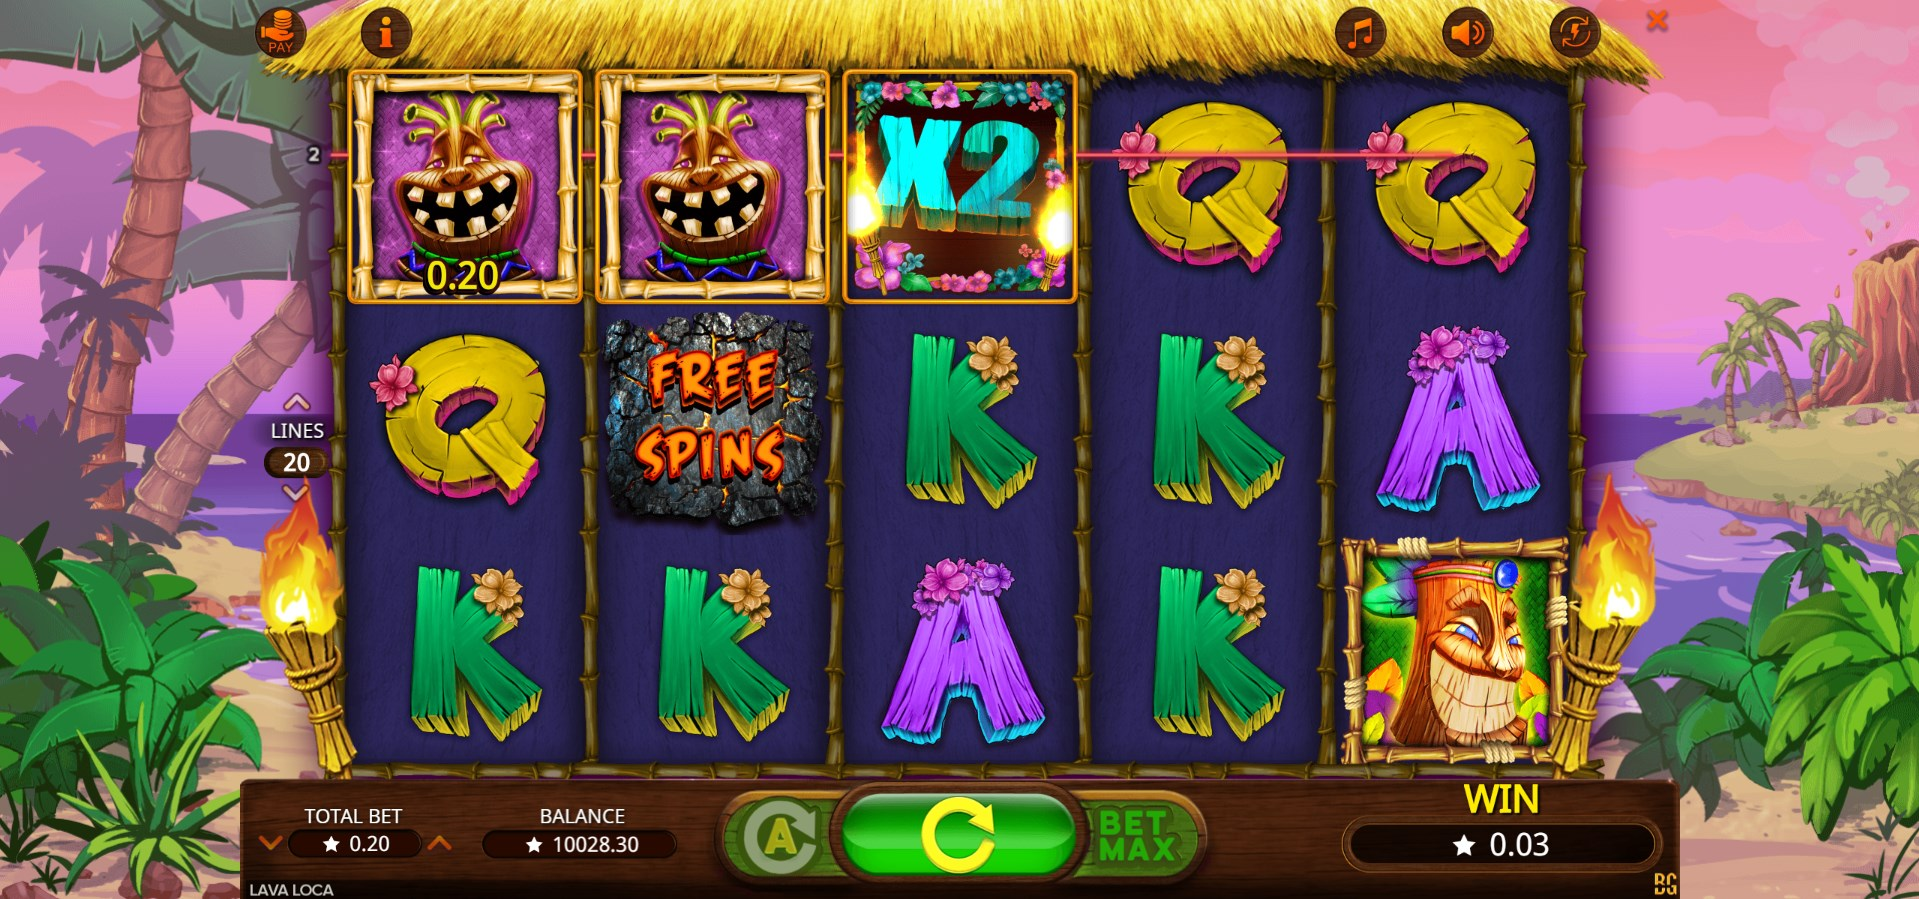 Lava Loca Slot Machine